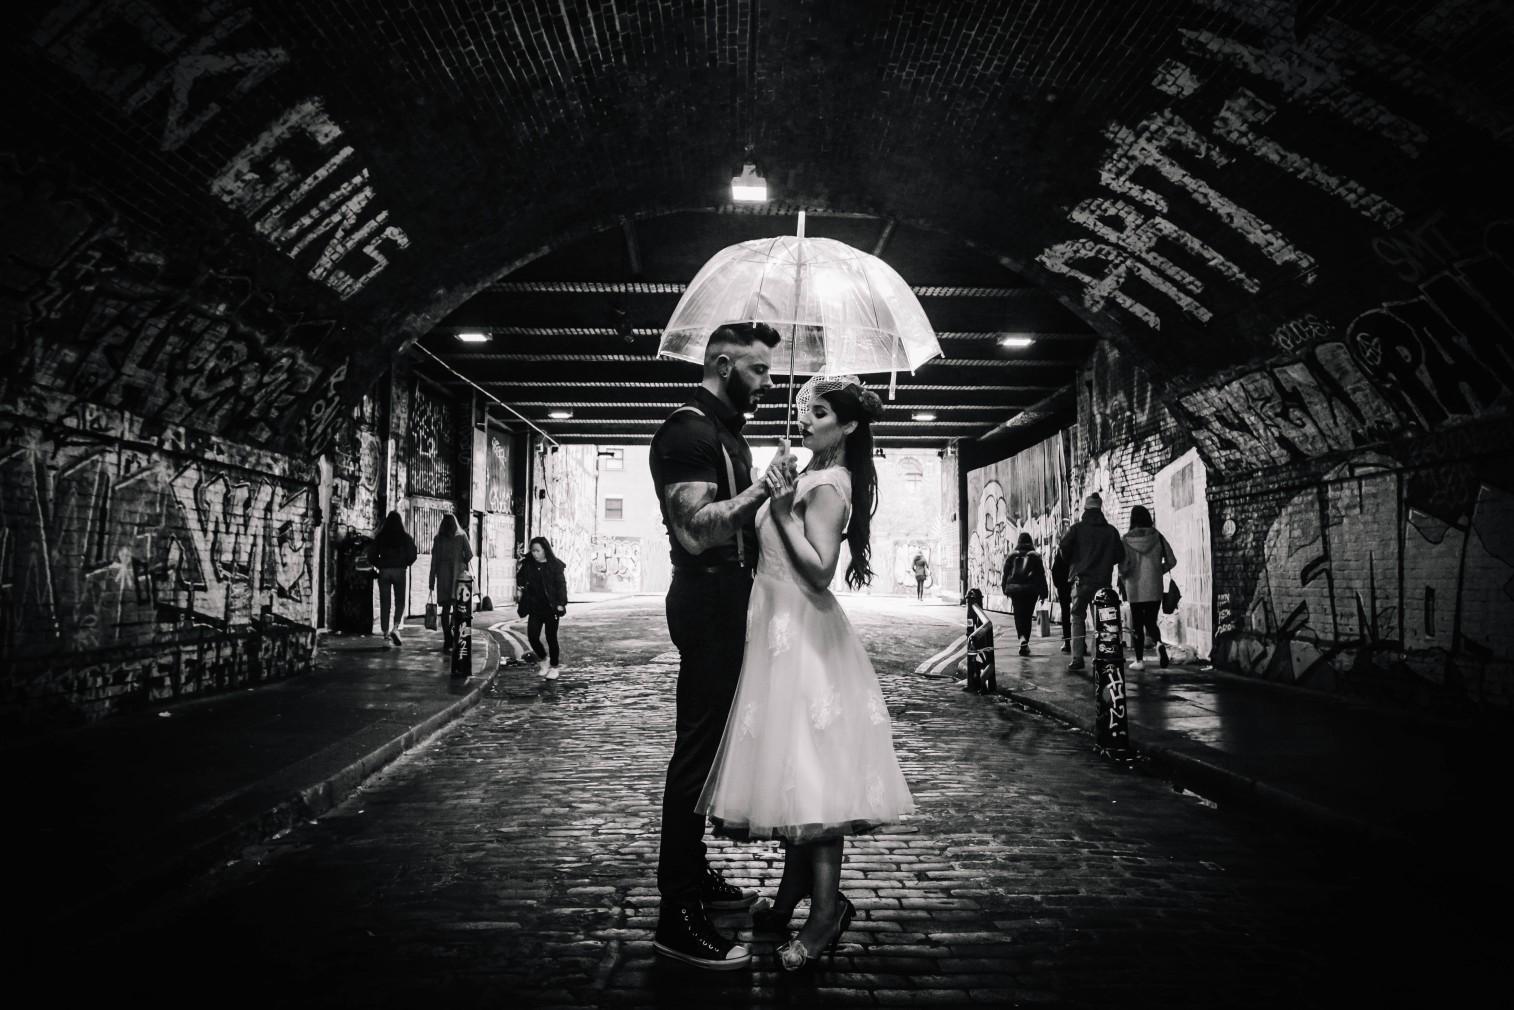 urban rockabilly wedding - east london wedding- urban wedding- rockabilly wedding- edgy wedding - retro wedding - alternative wedding- unconventional wedding- tattooed wedding- birdcage veil - black and white wedding photo